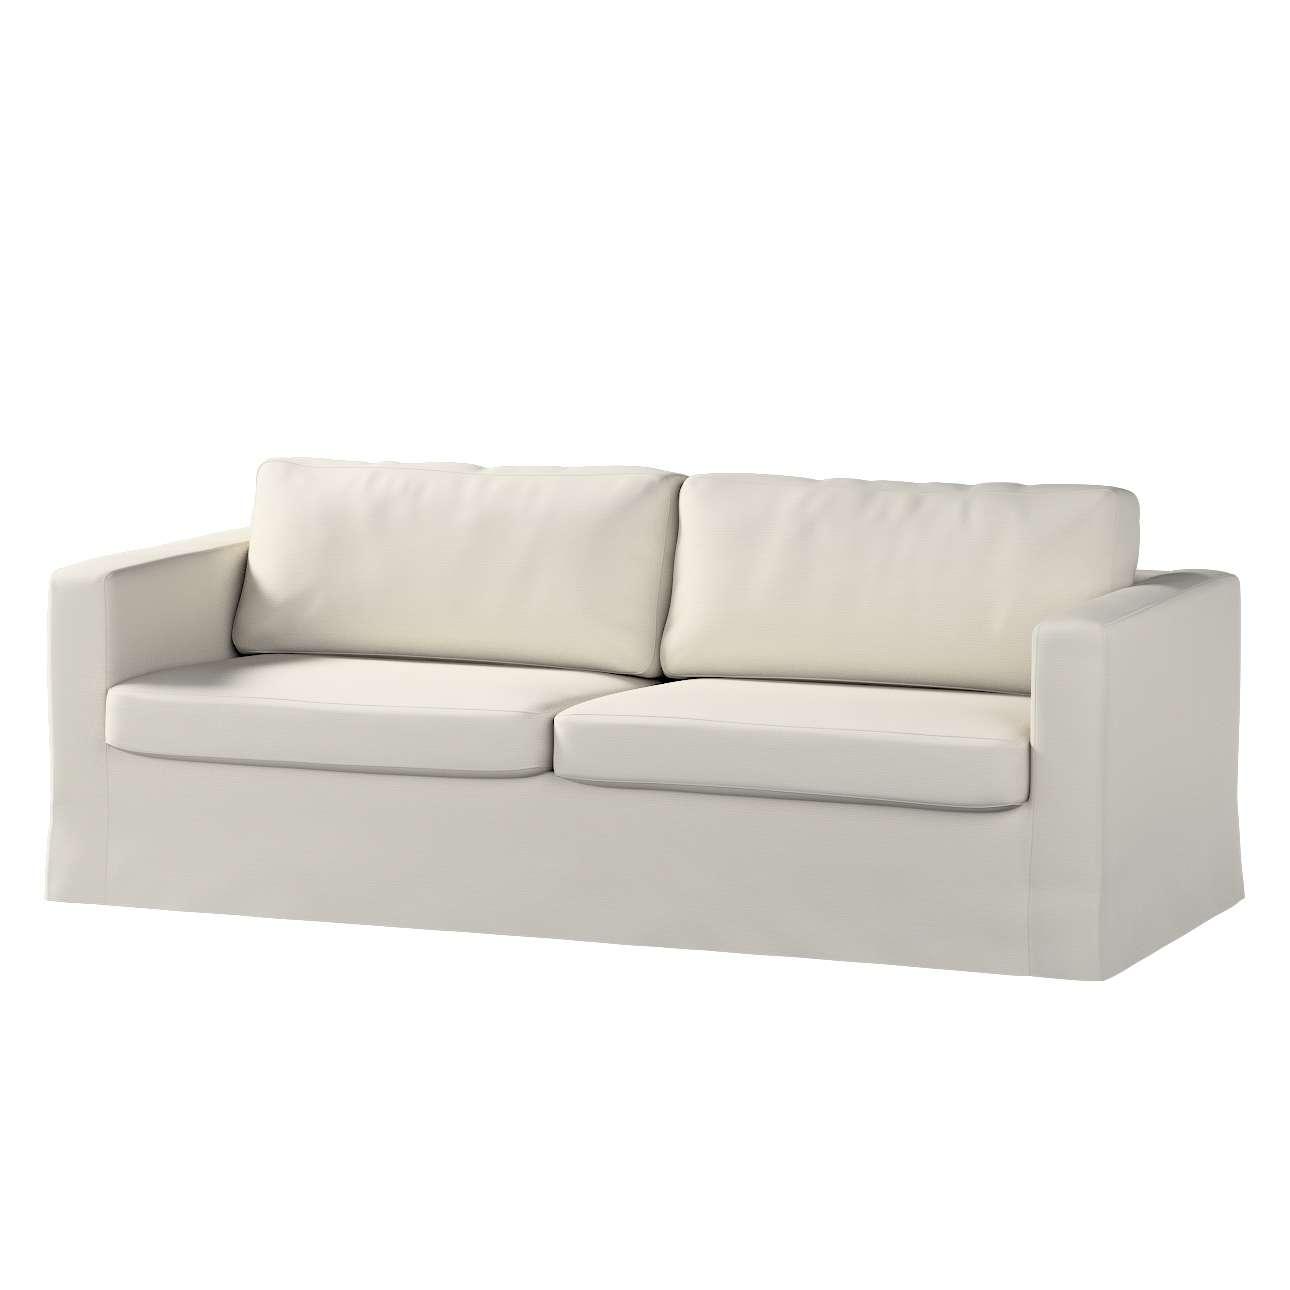 Floor Length Karlstad 3 Seater Sofa Cover Dove Grey 702